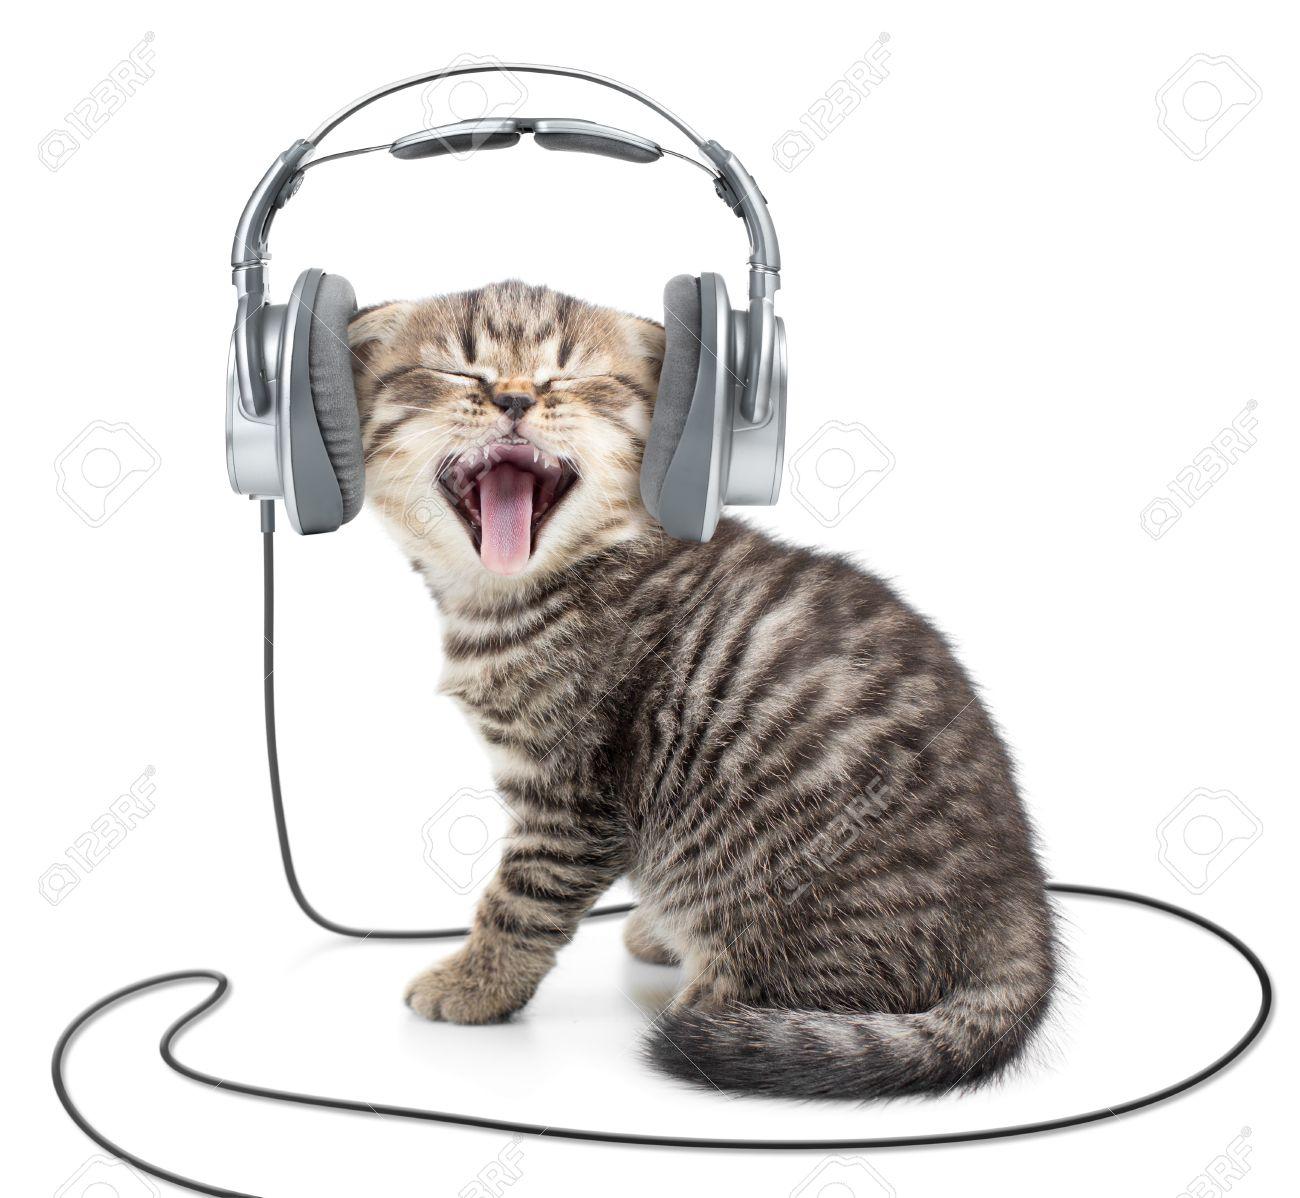 Singing Kitten Cat In Wired Headphones Listening To Music Stock ...